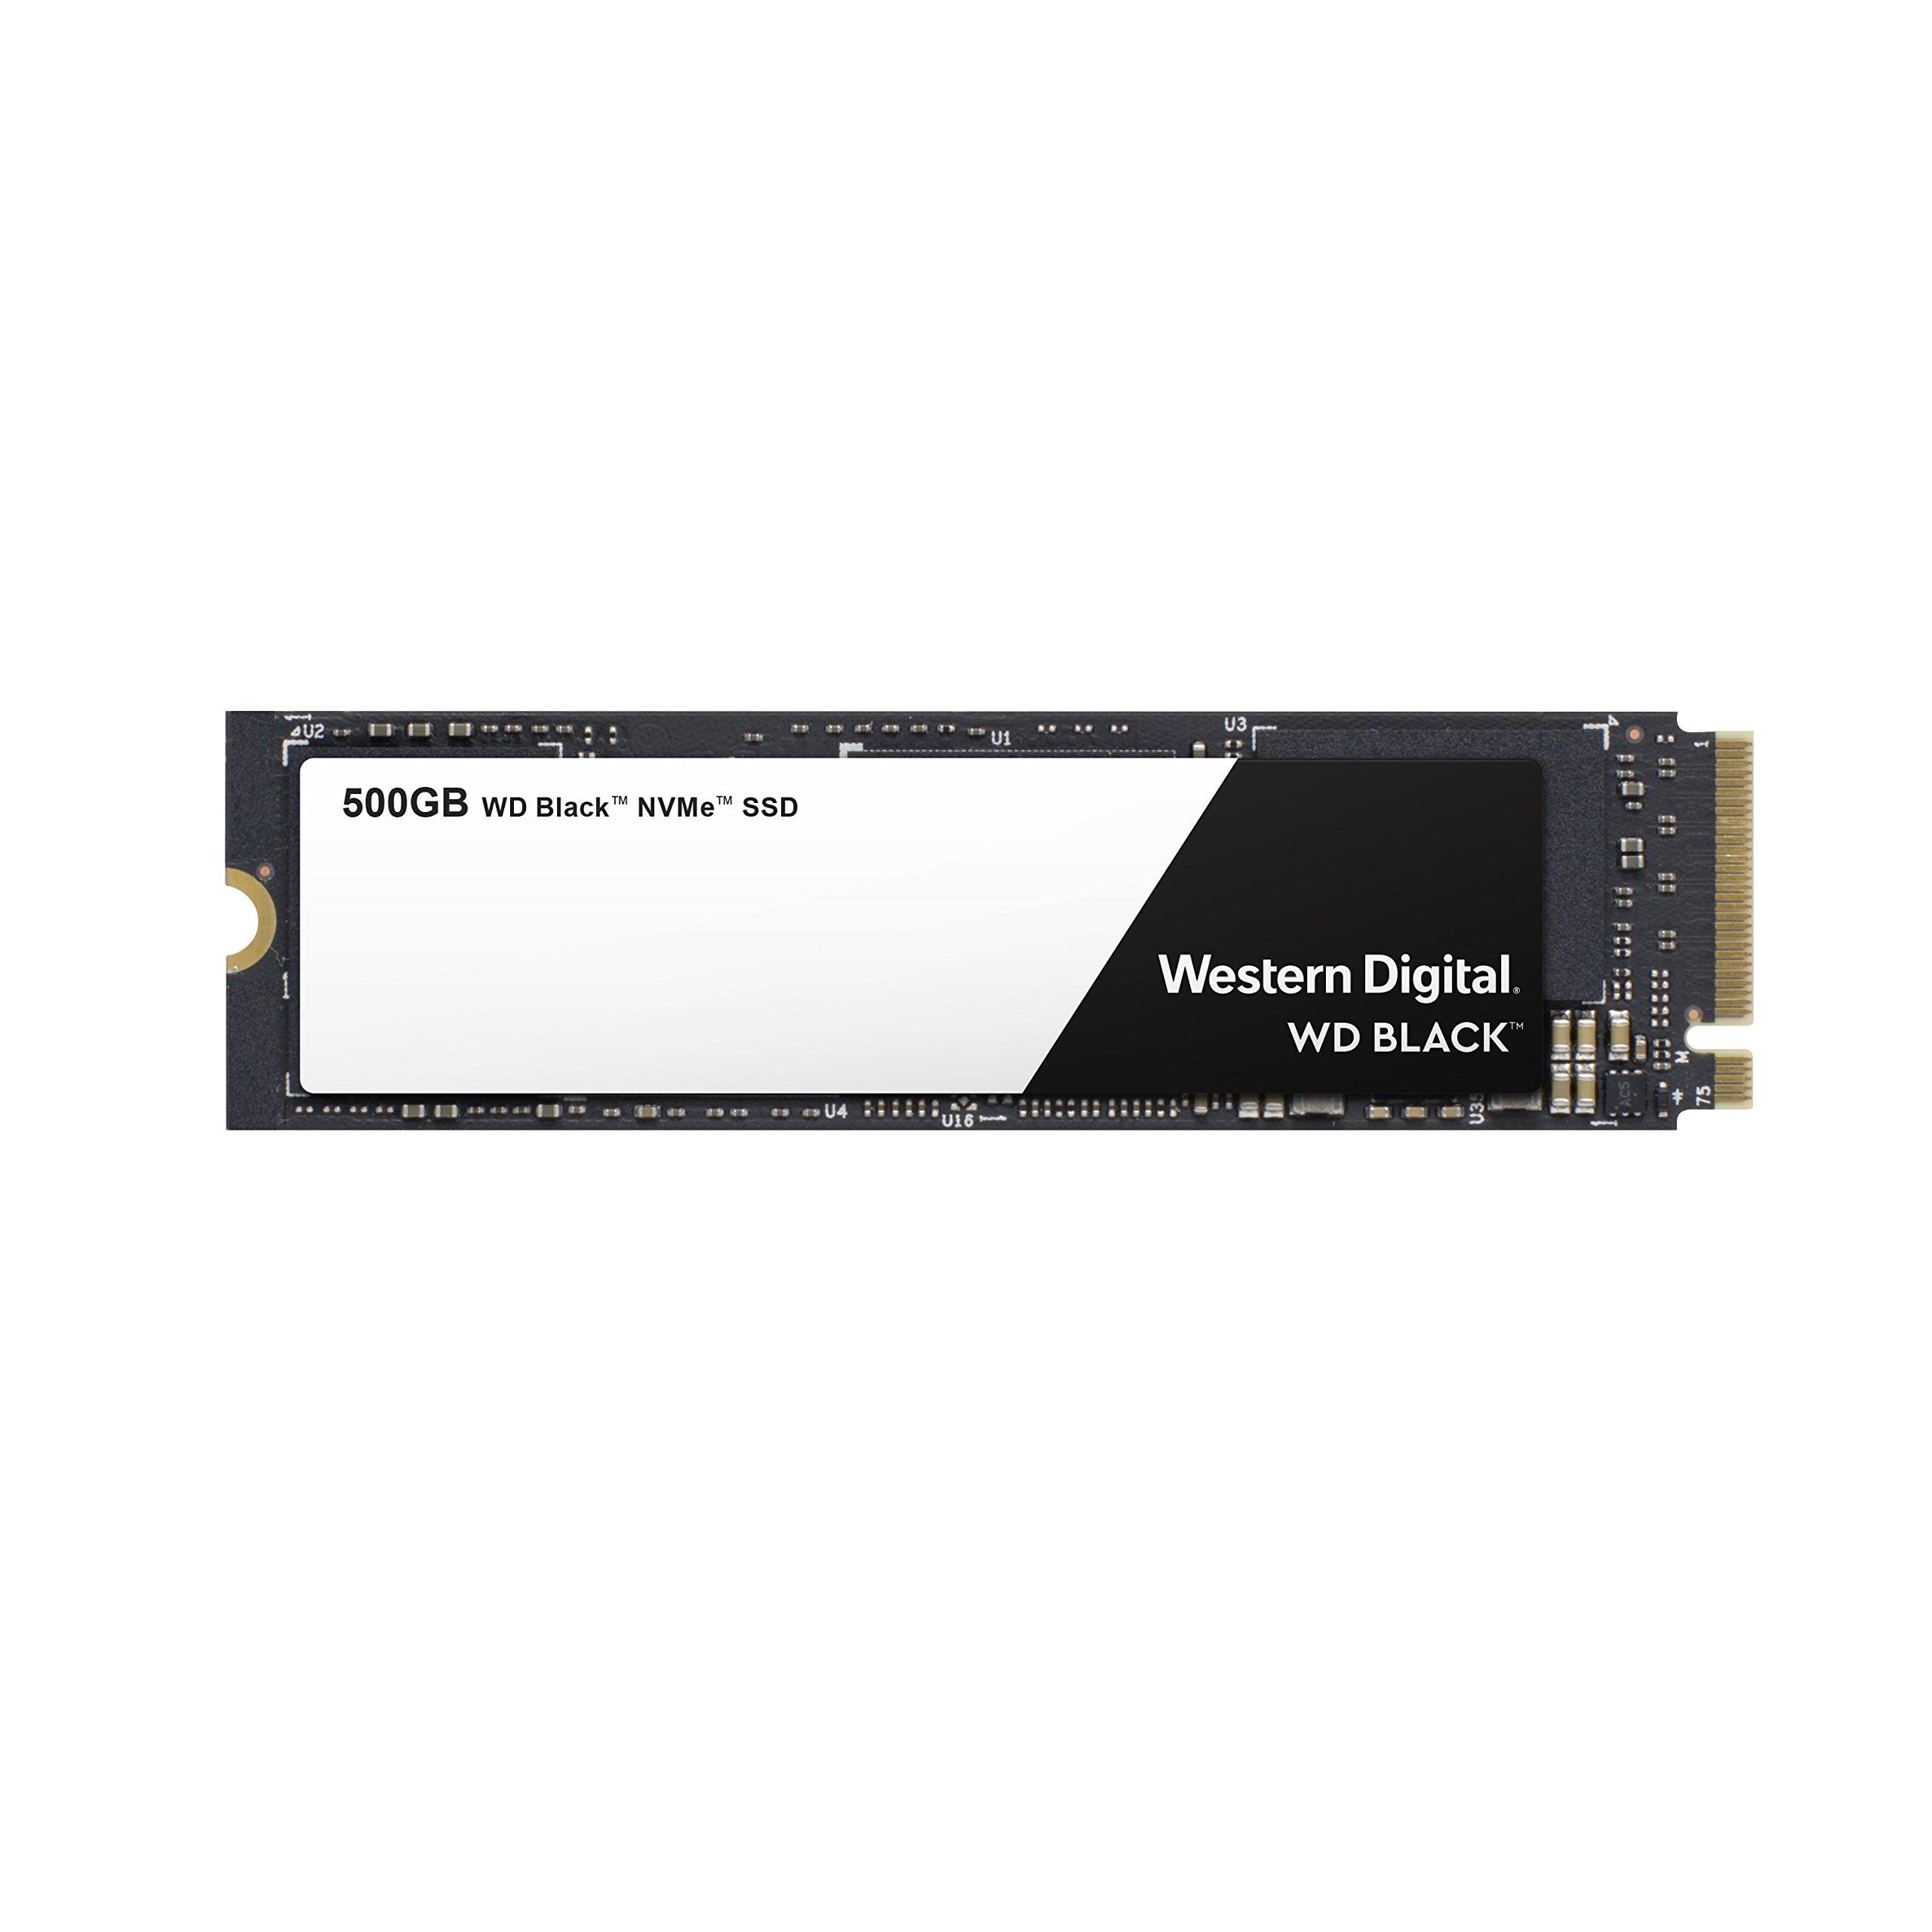 WD Black 500GB High-Performance NVMe PCIe Gen3 8 Gb/s M.2 2280 SSD -WDS500G2X0C